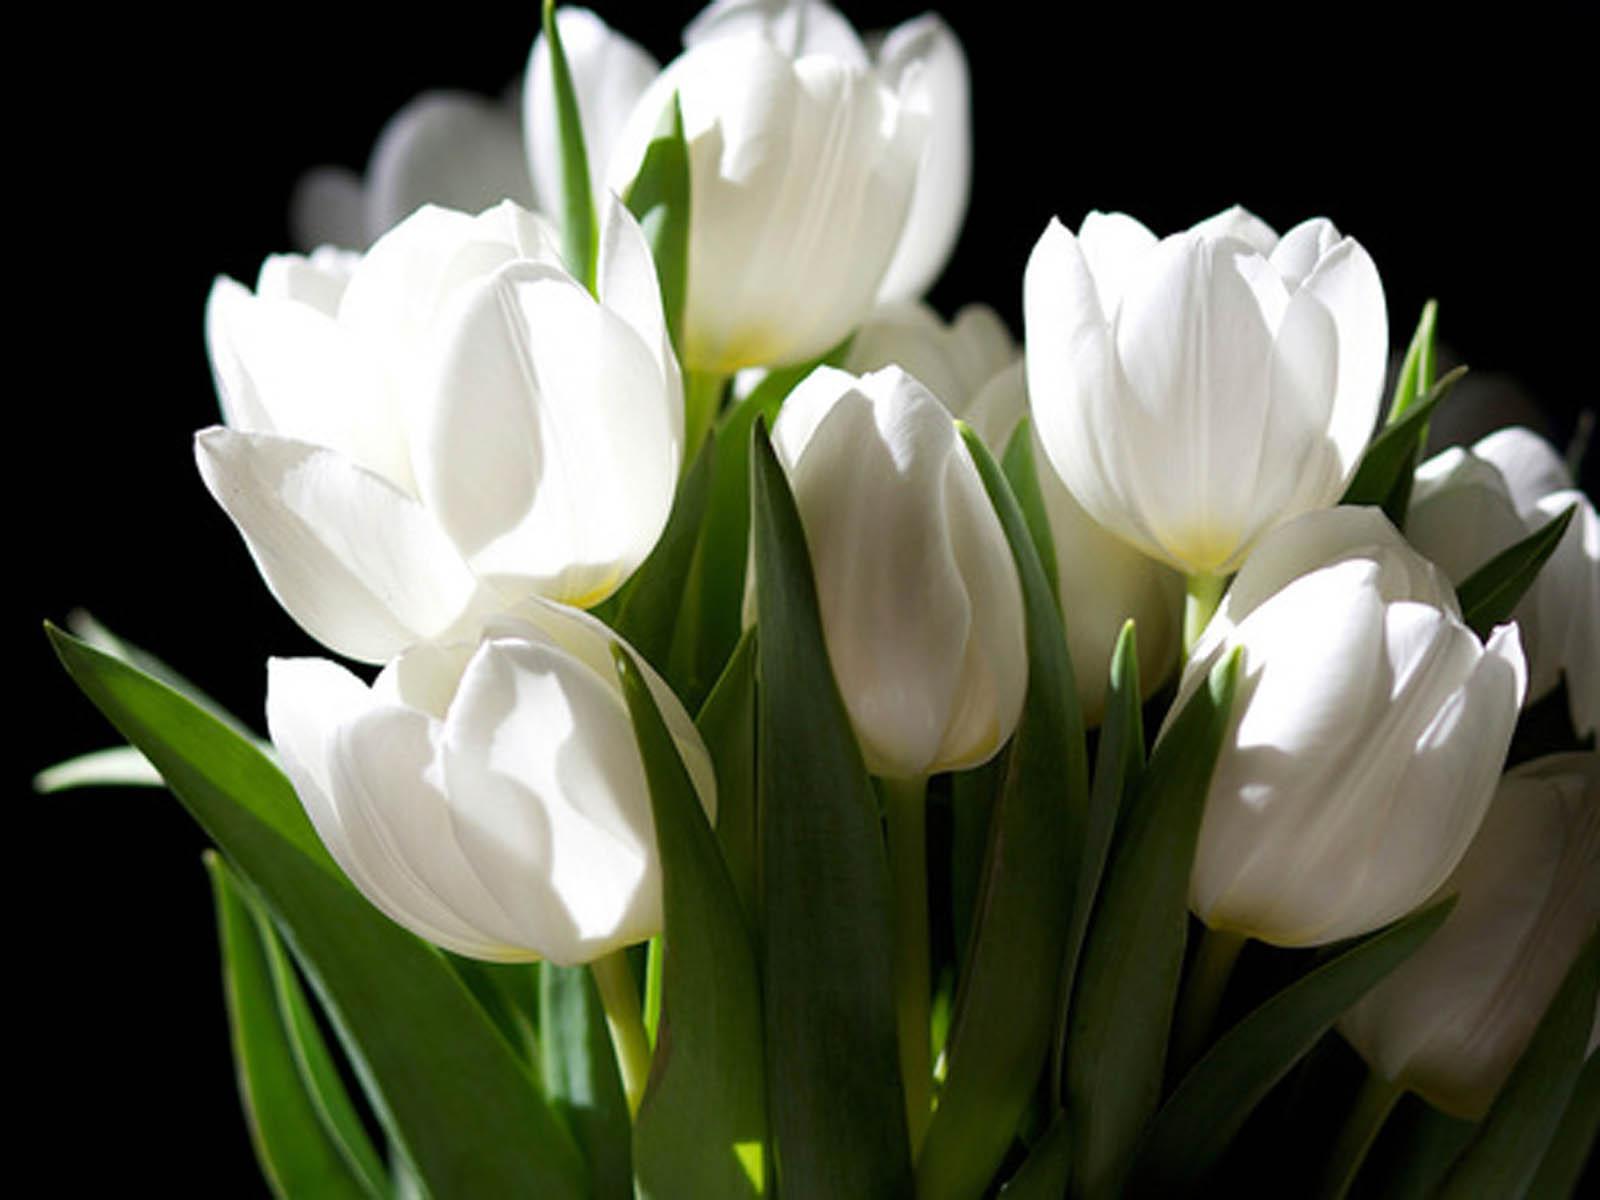 Images Of White Tulip Flower Wallpaper Spacehero